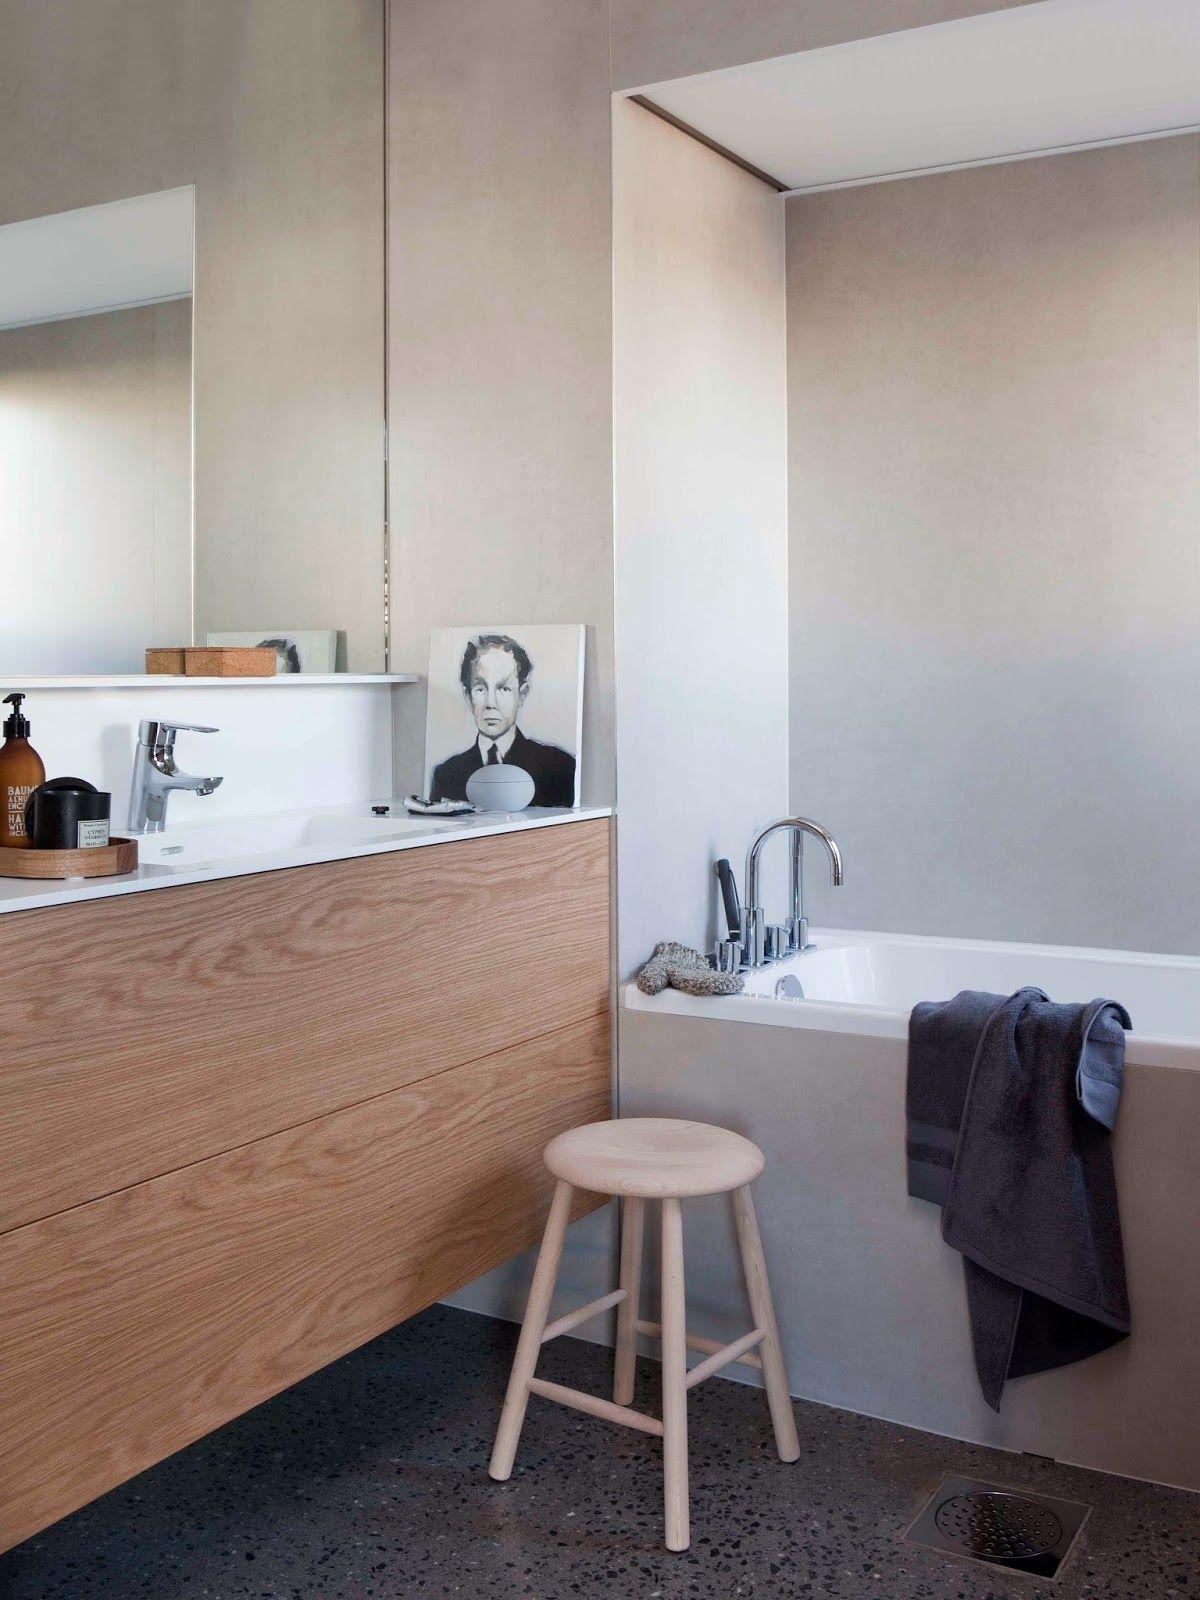 Wandfliesen gestalten bilder scandinavian retreat  bathroom  pinterest  badezimmer baden und